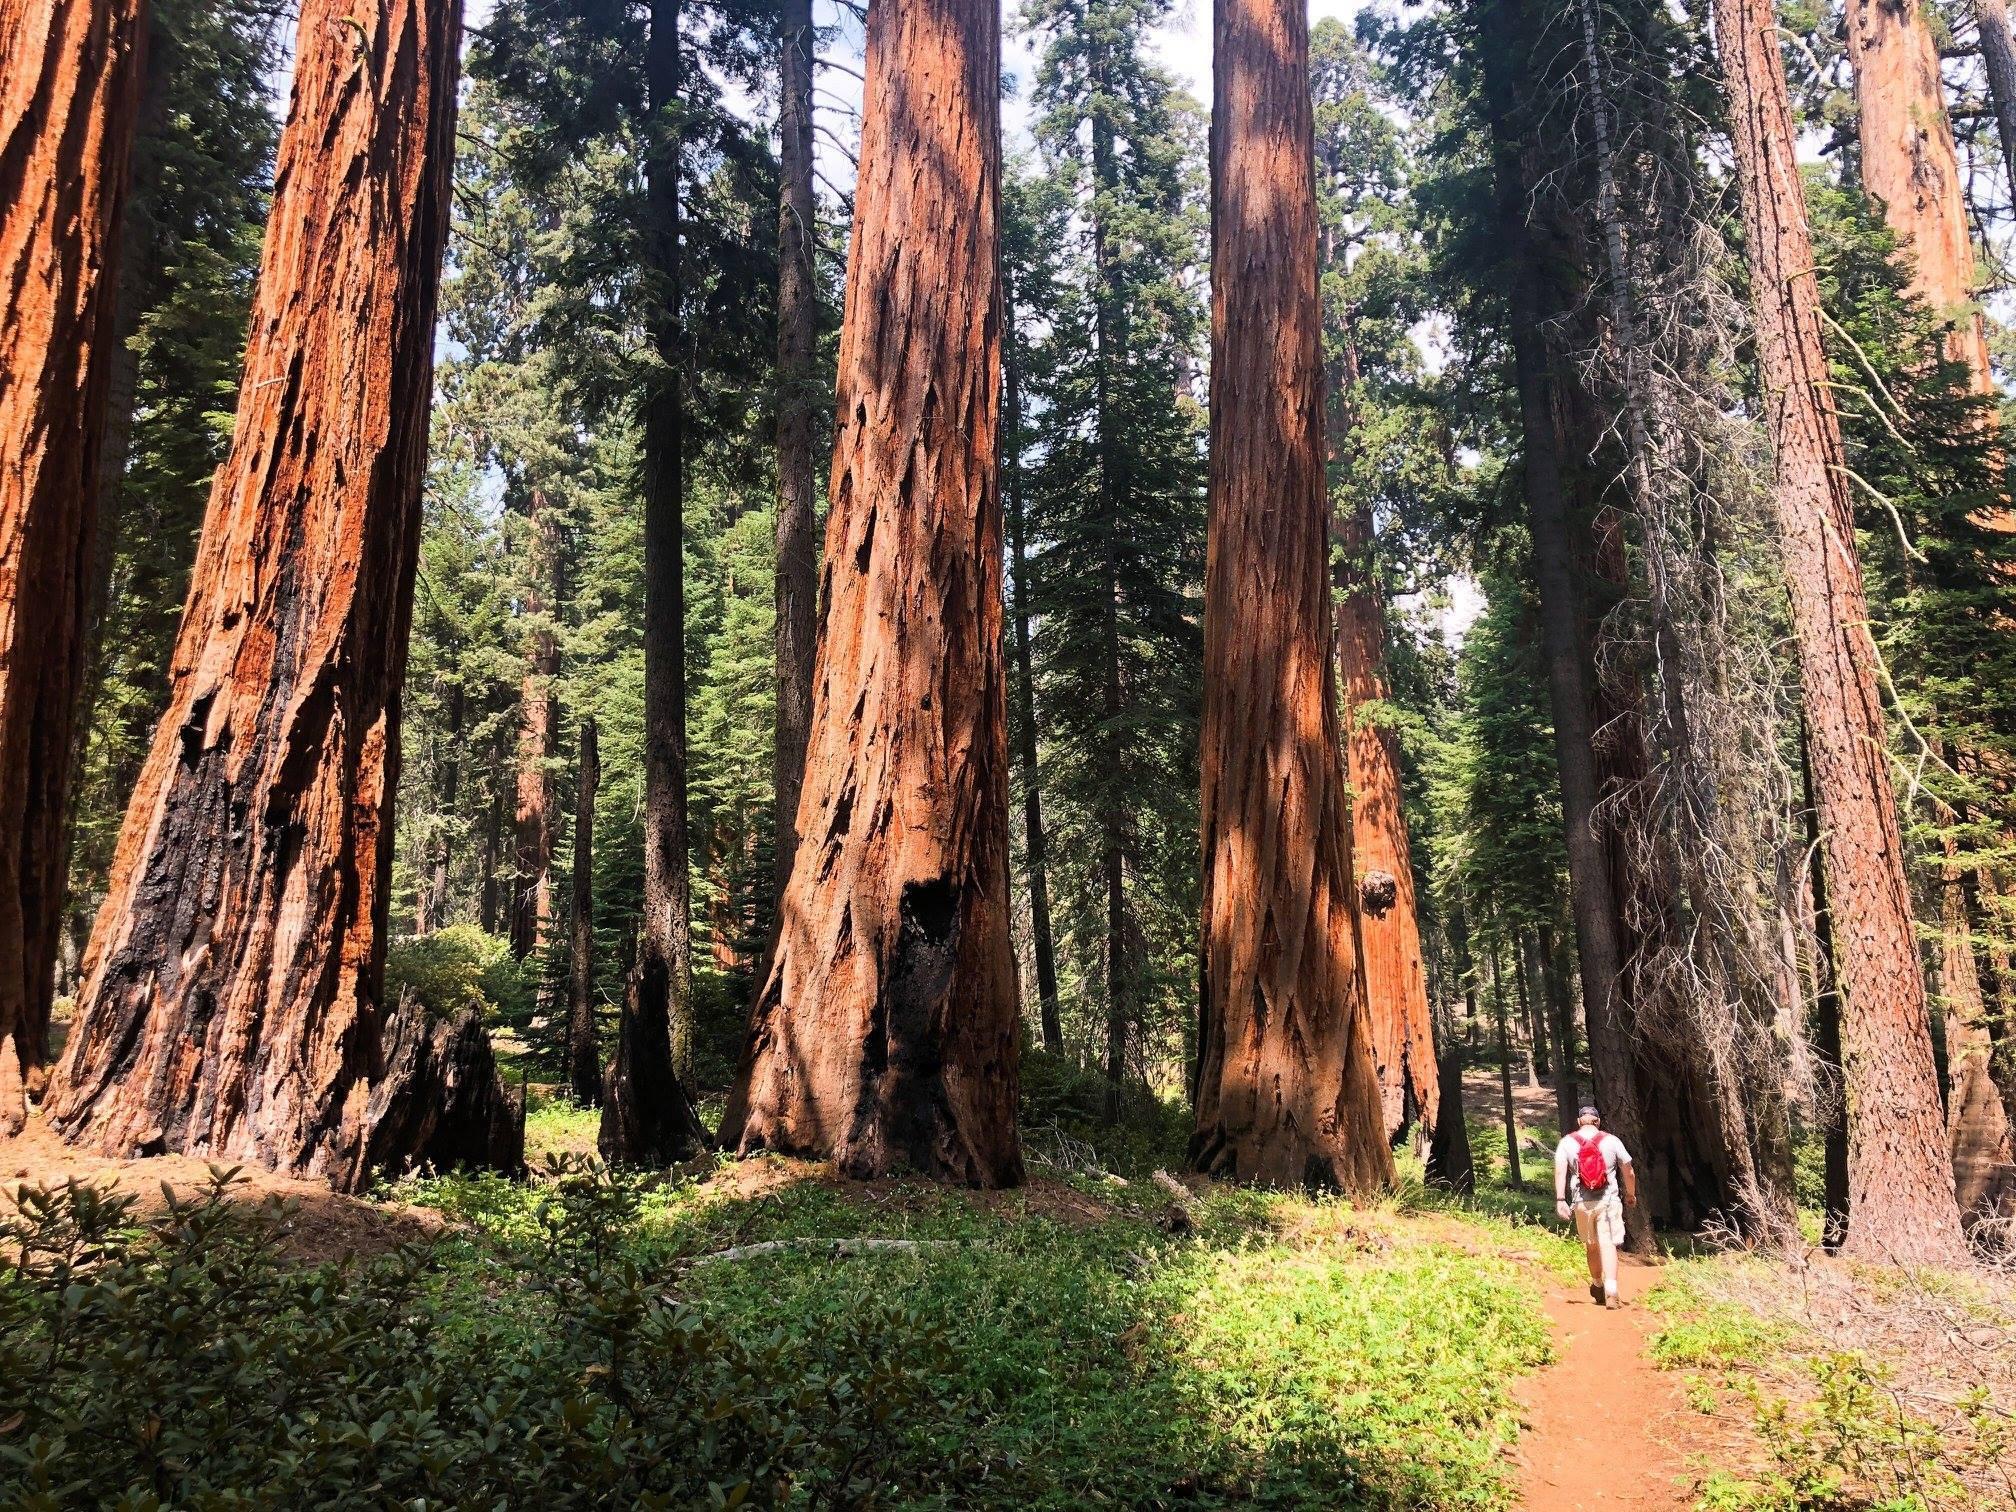 Sequoia National Park Sept 2018